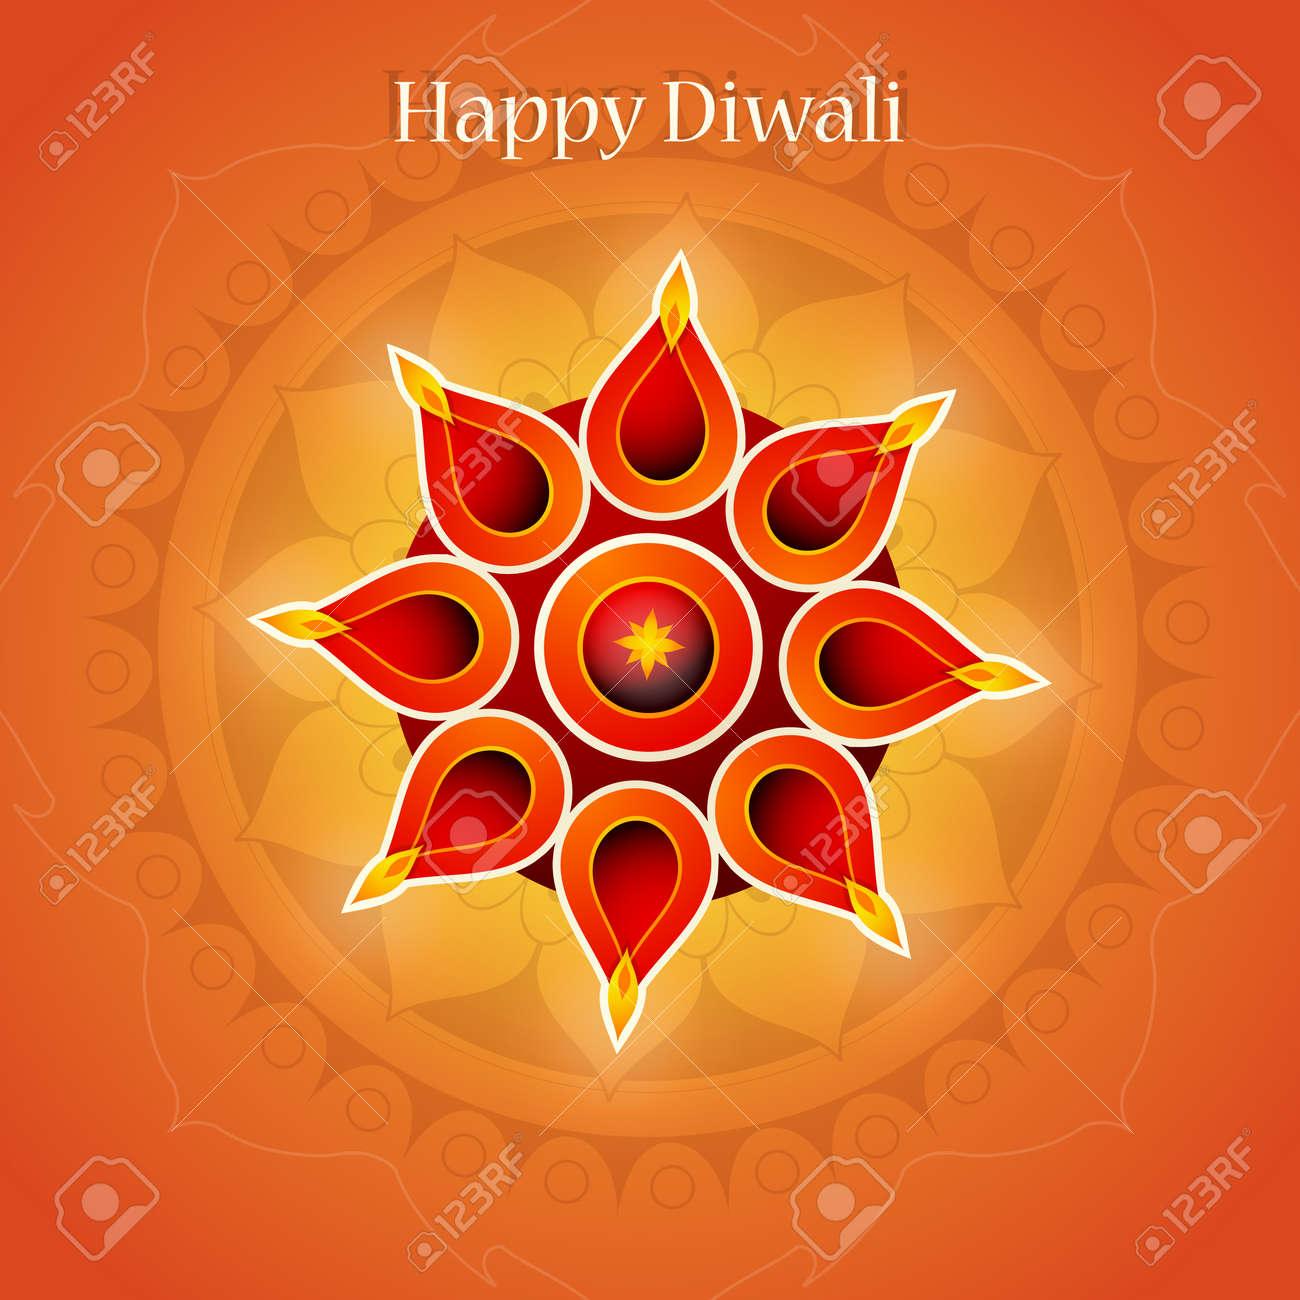 Diwali festival greeting card design with traditional ornament diwali festival greeting card design with traditional ornament stock vector 64510723 m4hsunfo